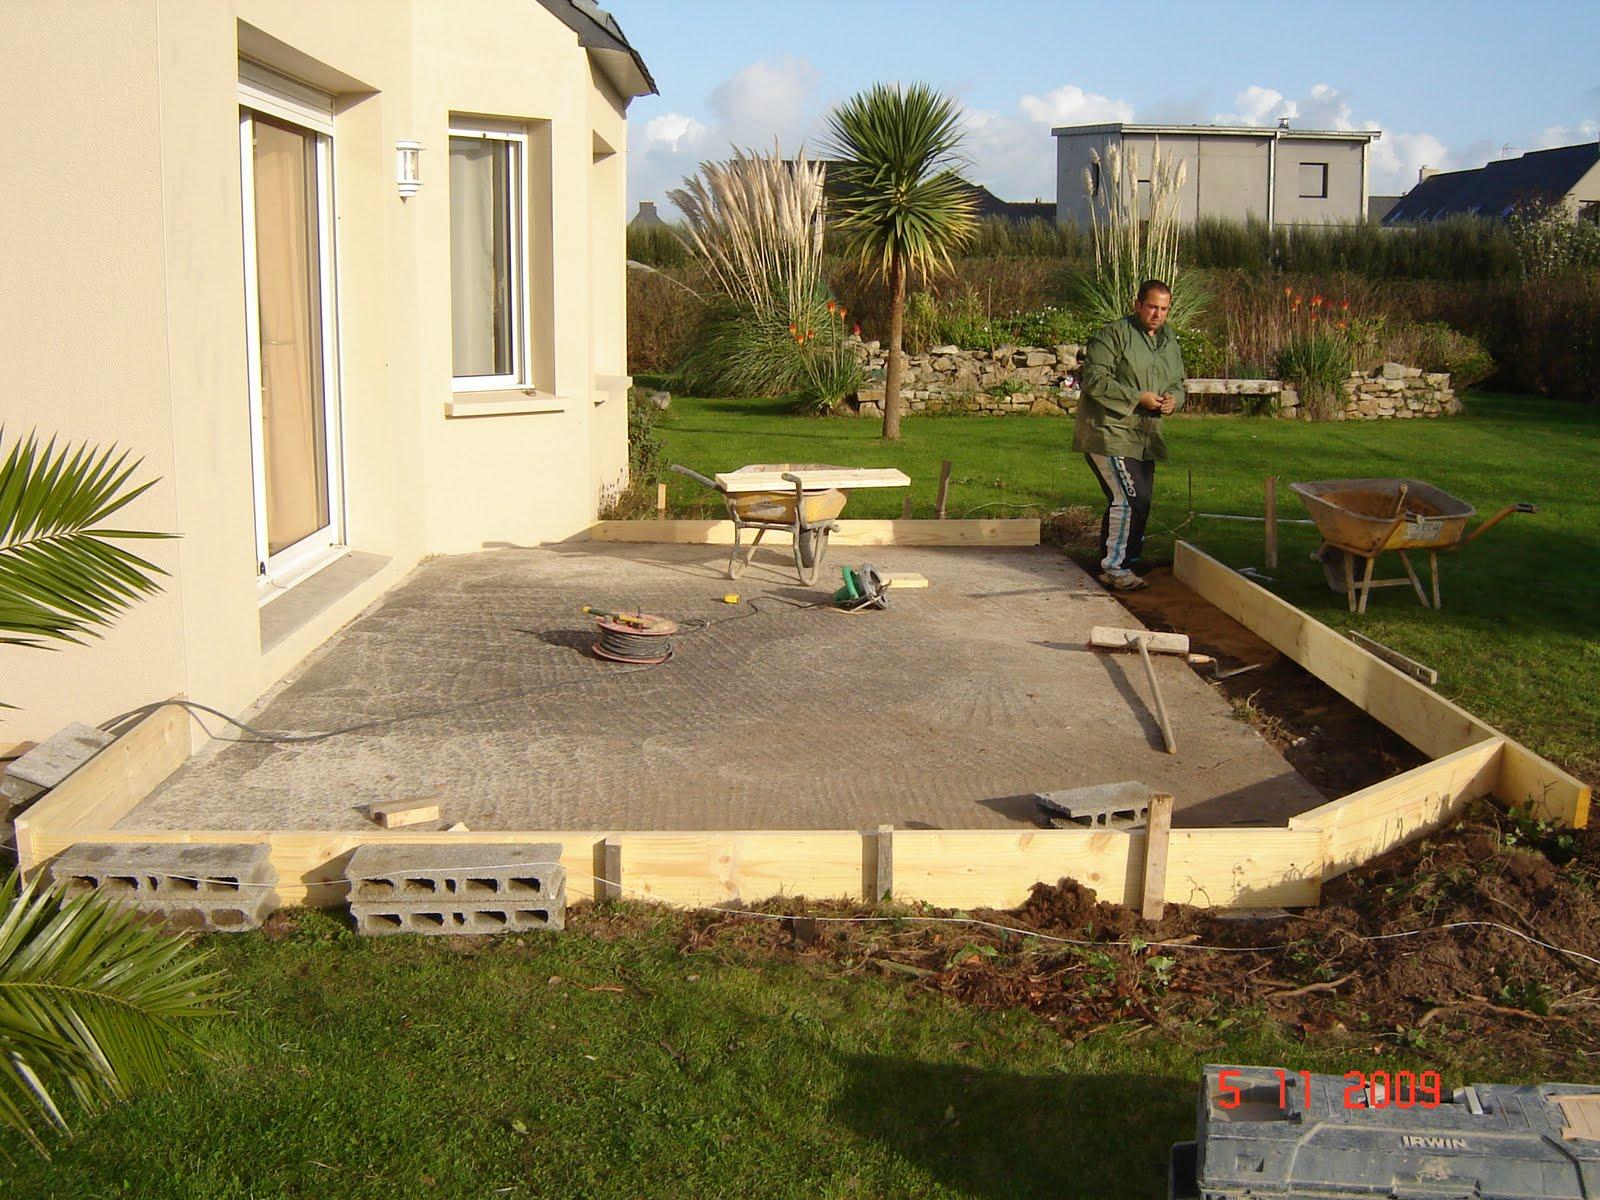 dalle beton veranda construction groes oeuvre